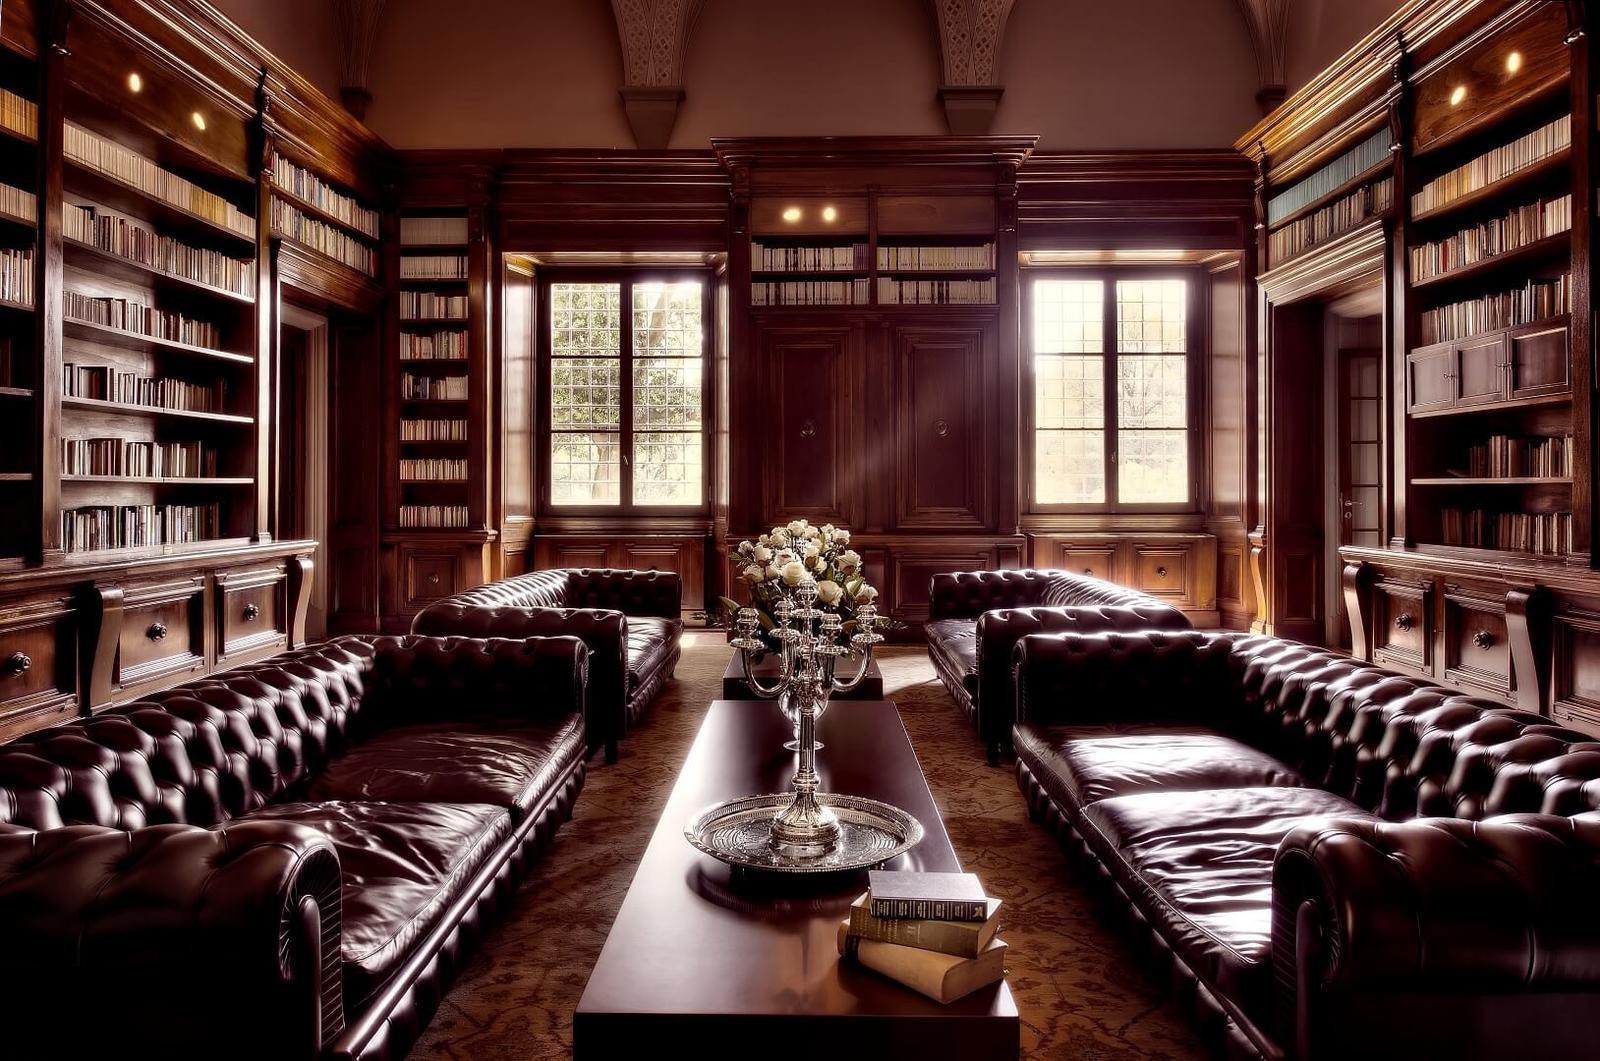 mejores hoteles con biblioteca Il Salvatino